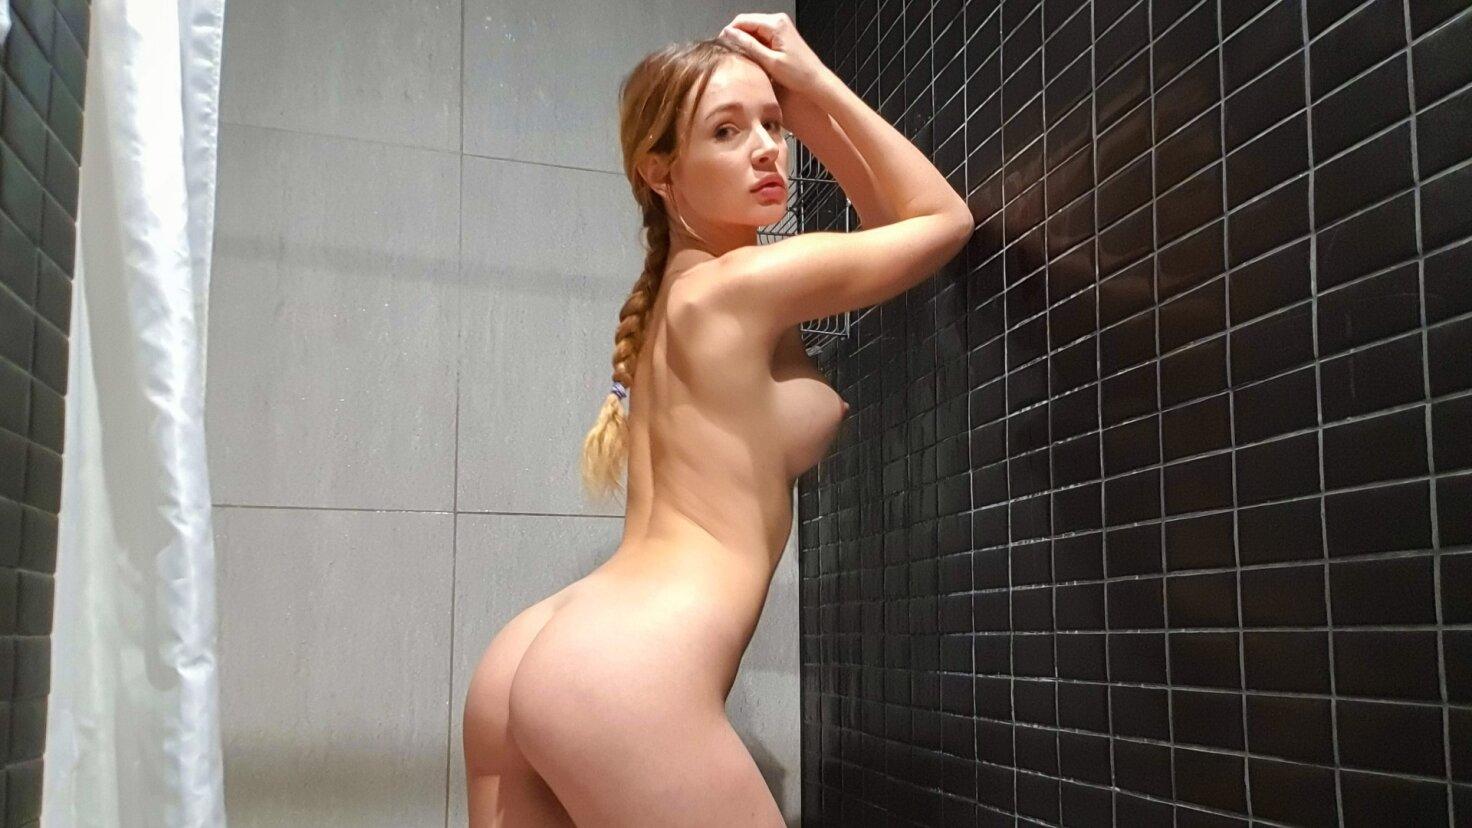 Terapia de ducha caliente